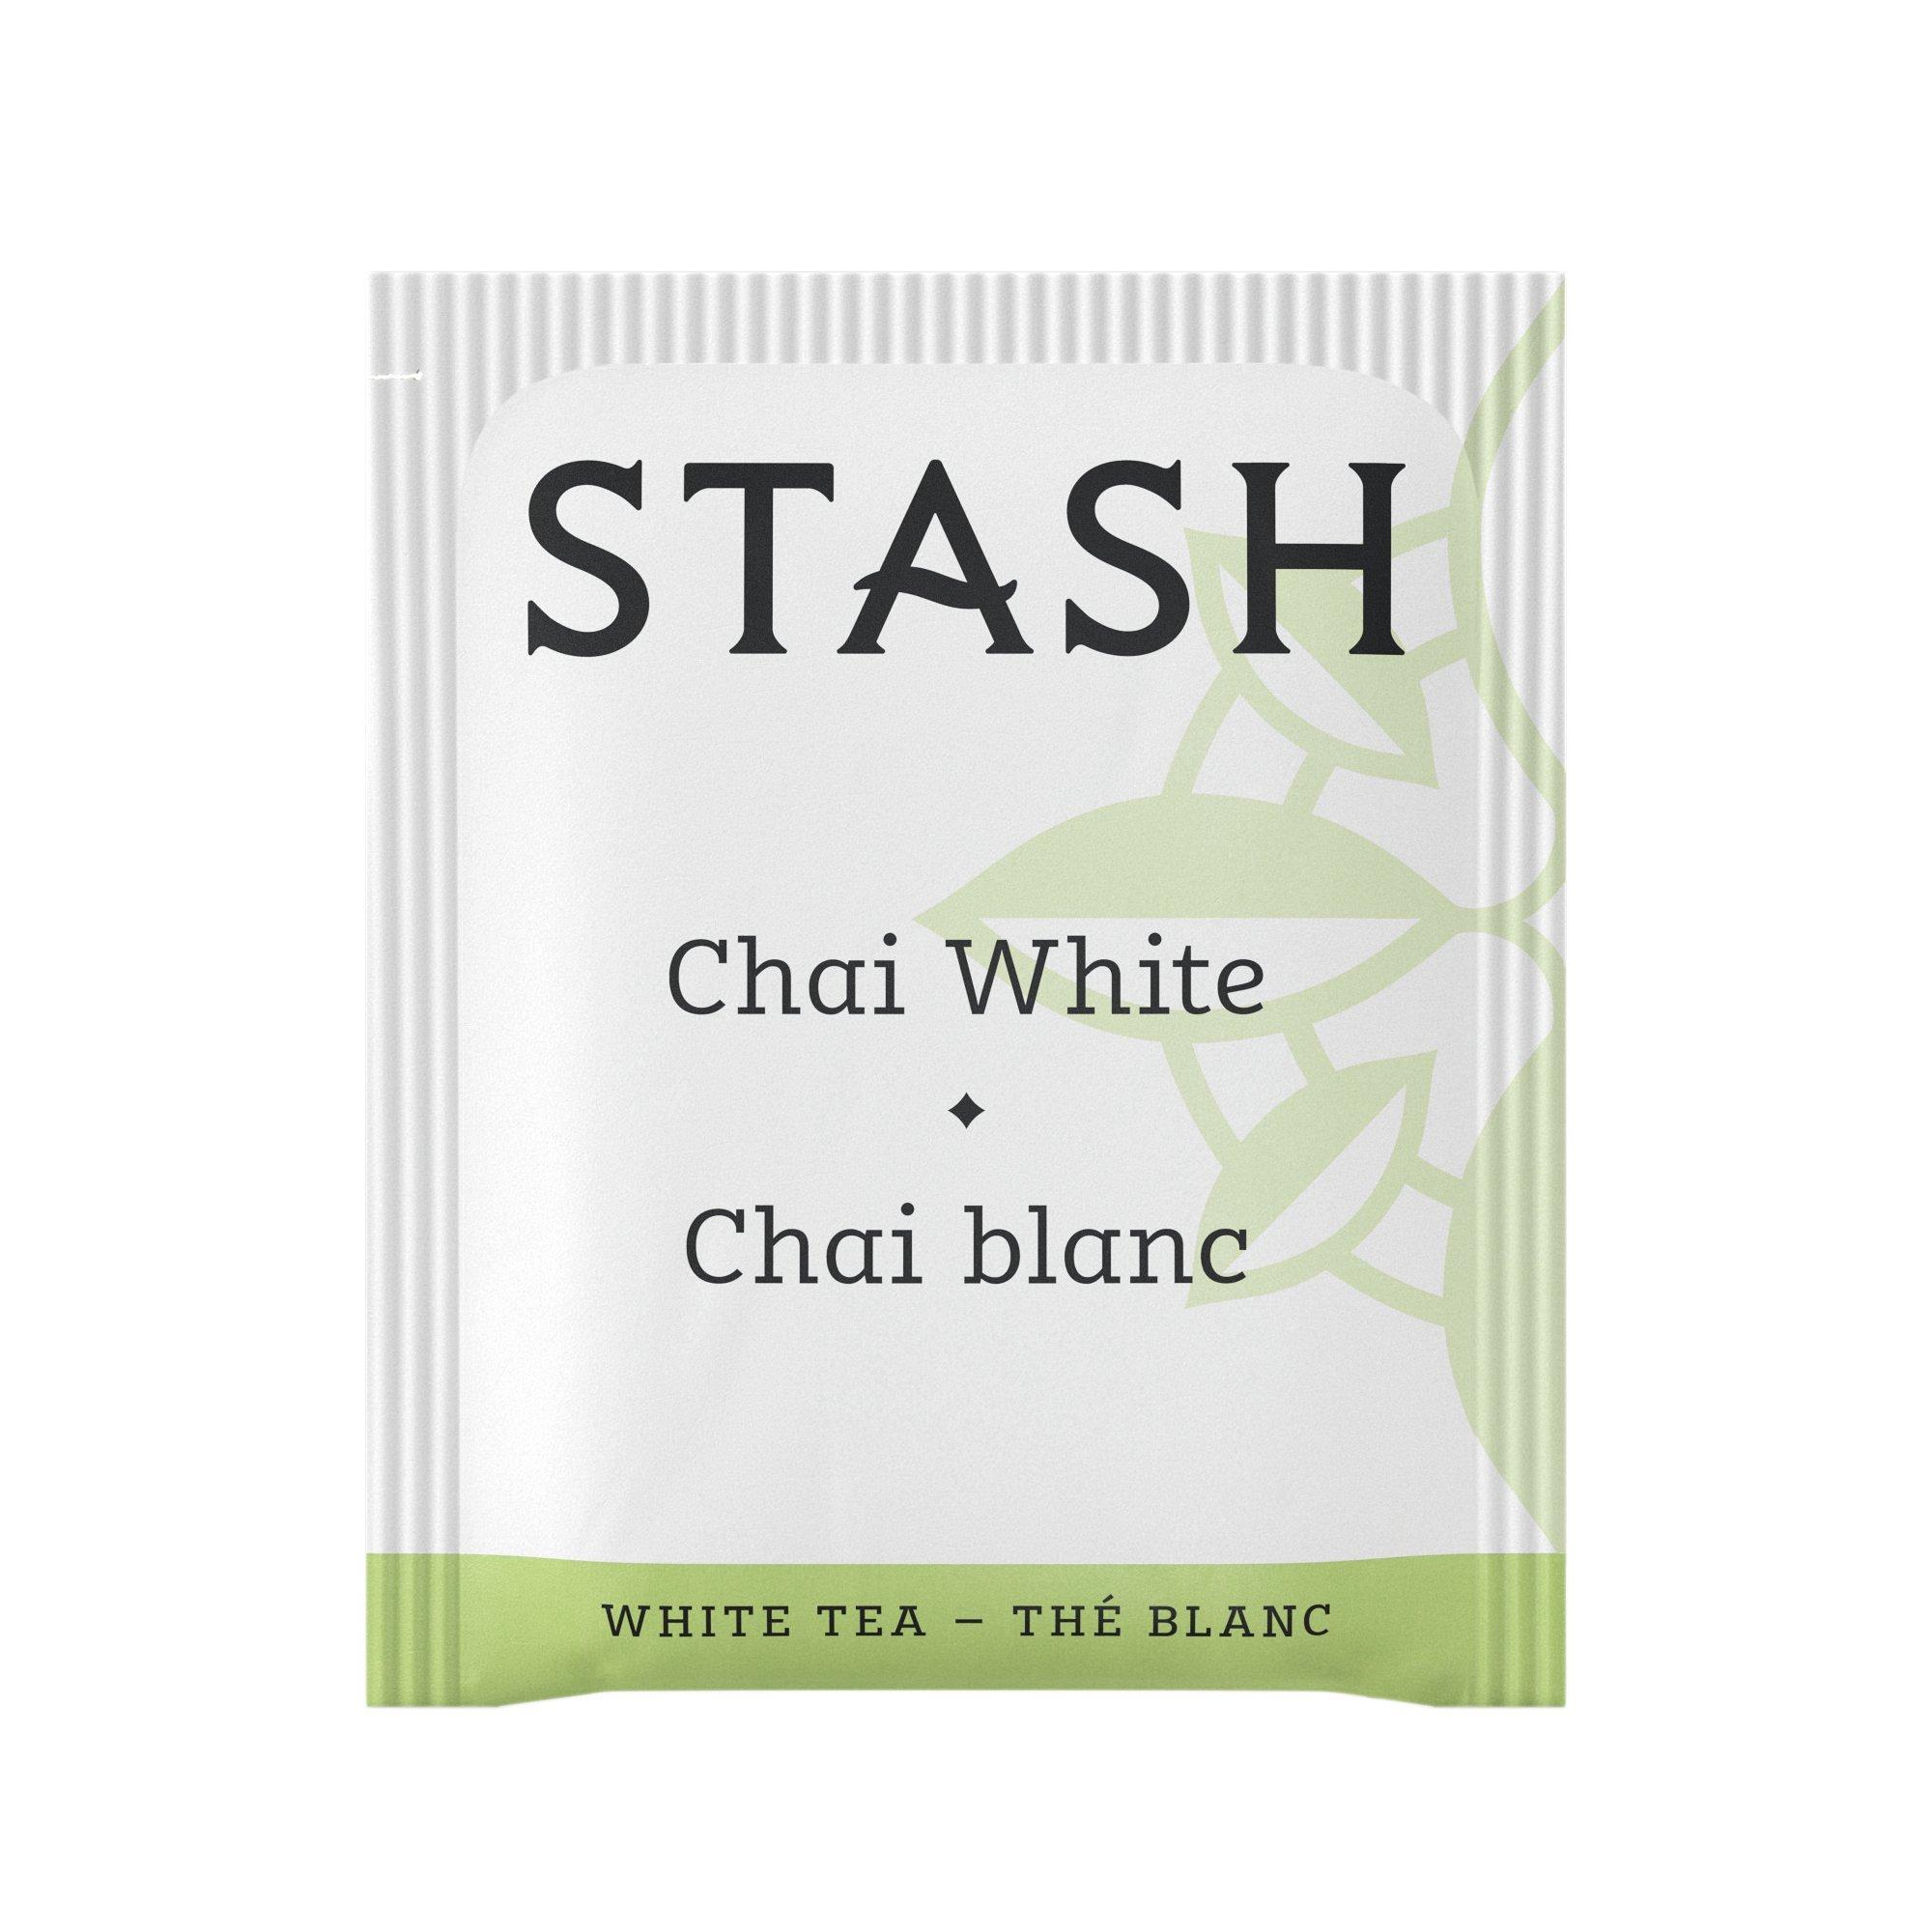 Stash Tea White Chai Tea 1000 Count Tea Bags in Foil Individual Spiced White Tea Bags for Use in Teapots Mugs or Cups, Brew Hot Tea or Iced Tea by Stash Tea (Image #3)